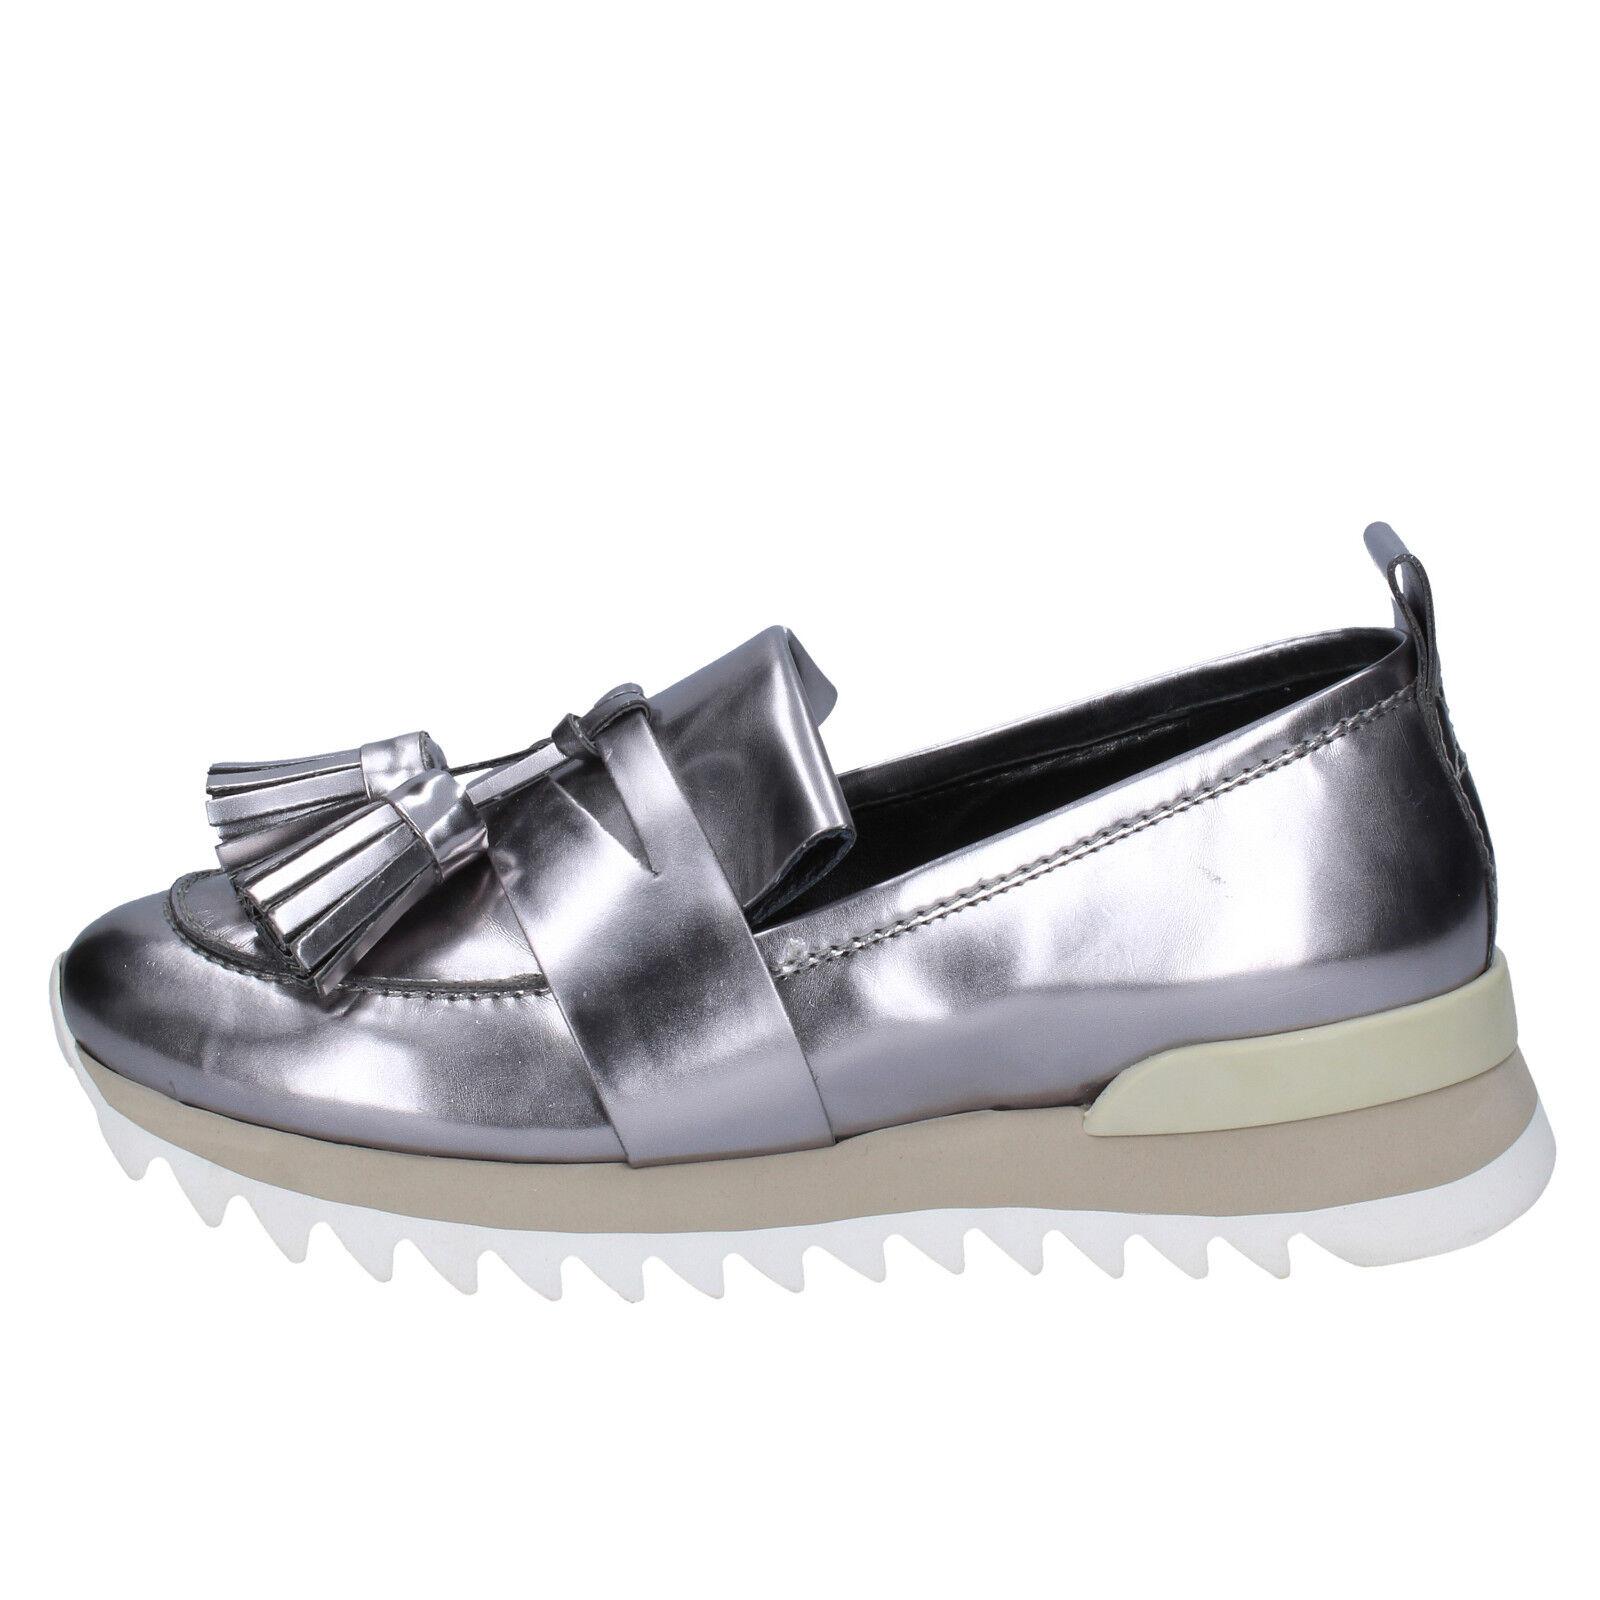 scarpe donna MY GREY MER 40 mocassini argento pelle BX38-40